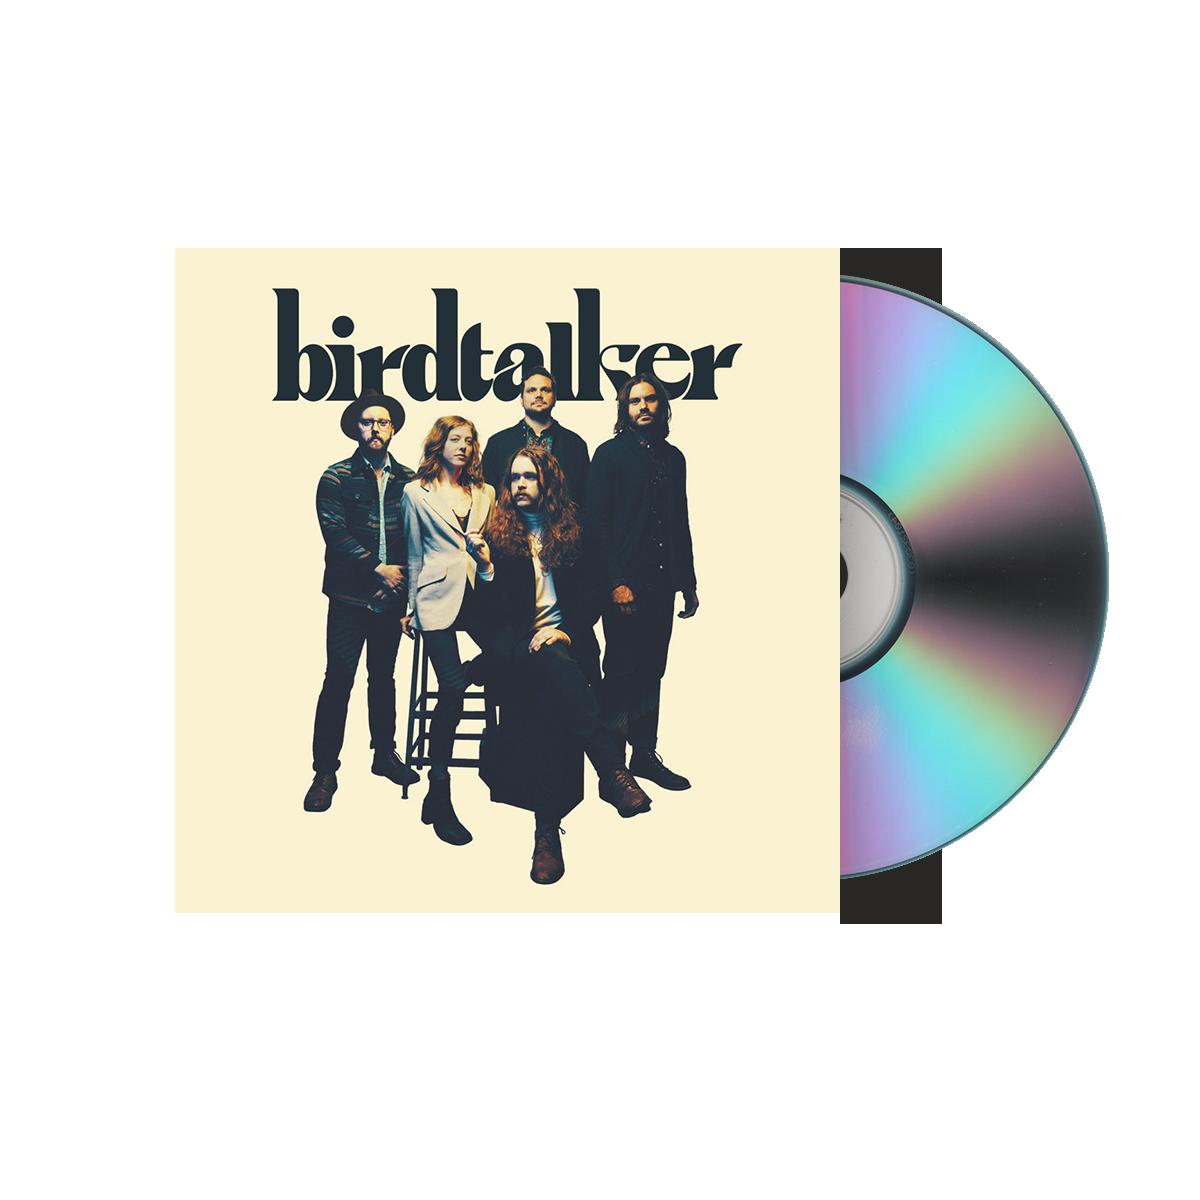 Birdtalker LP - Vinyl, CD